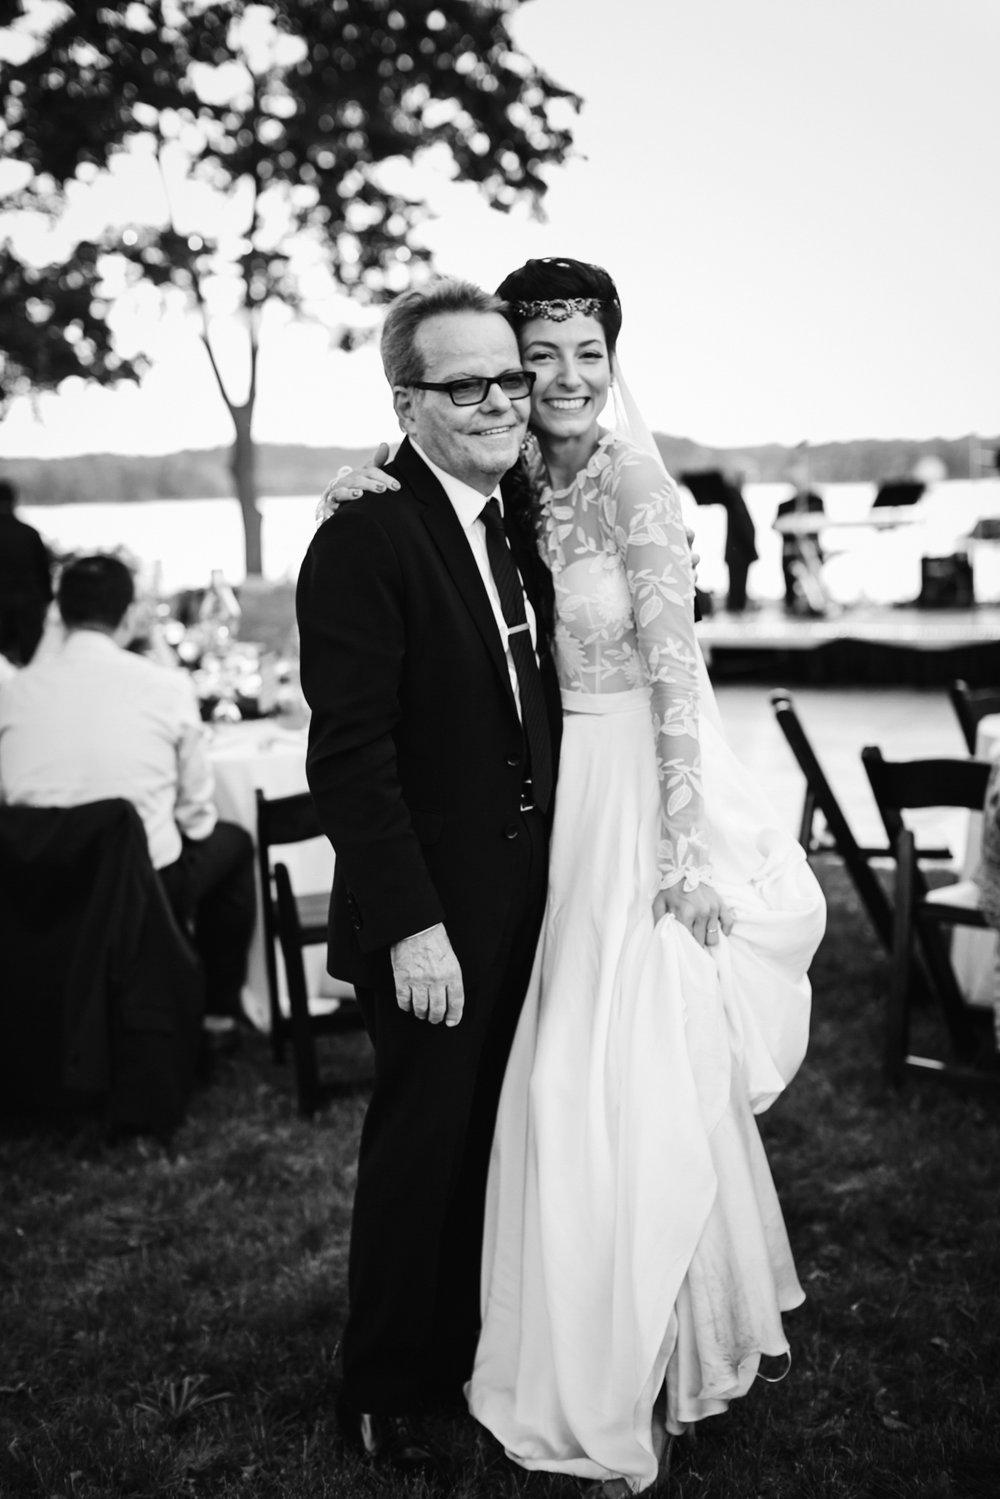 Kimberly-Coccagnia-Wedding-Photographer-253.JPG